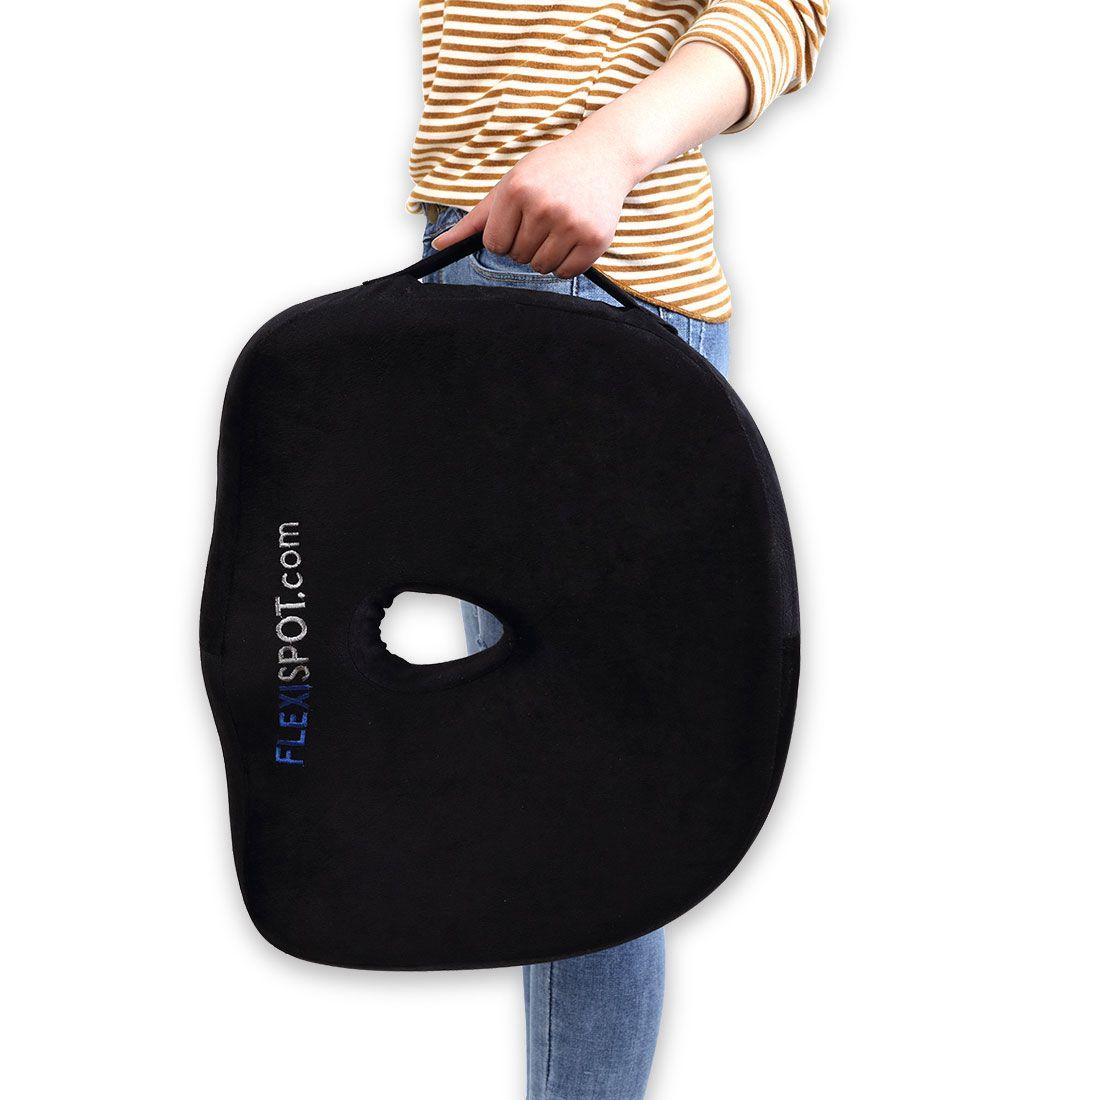 Flexispot sitting cushions